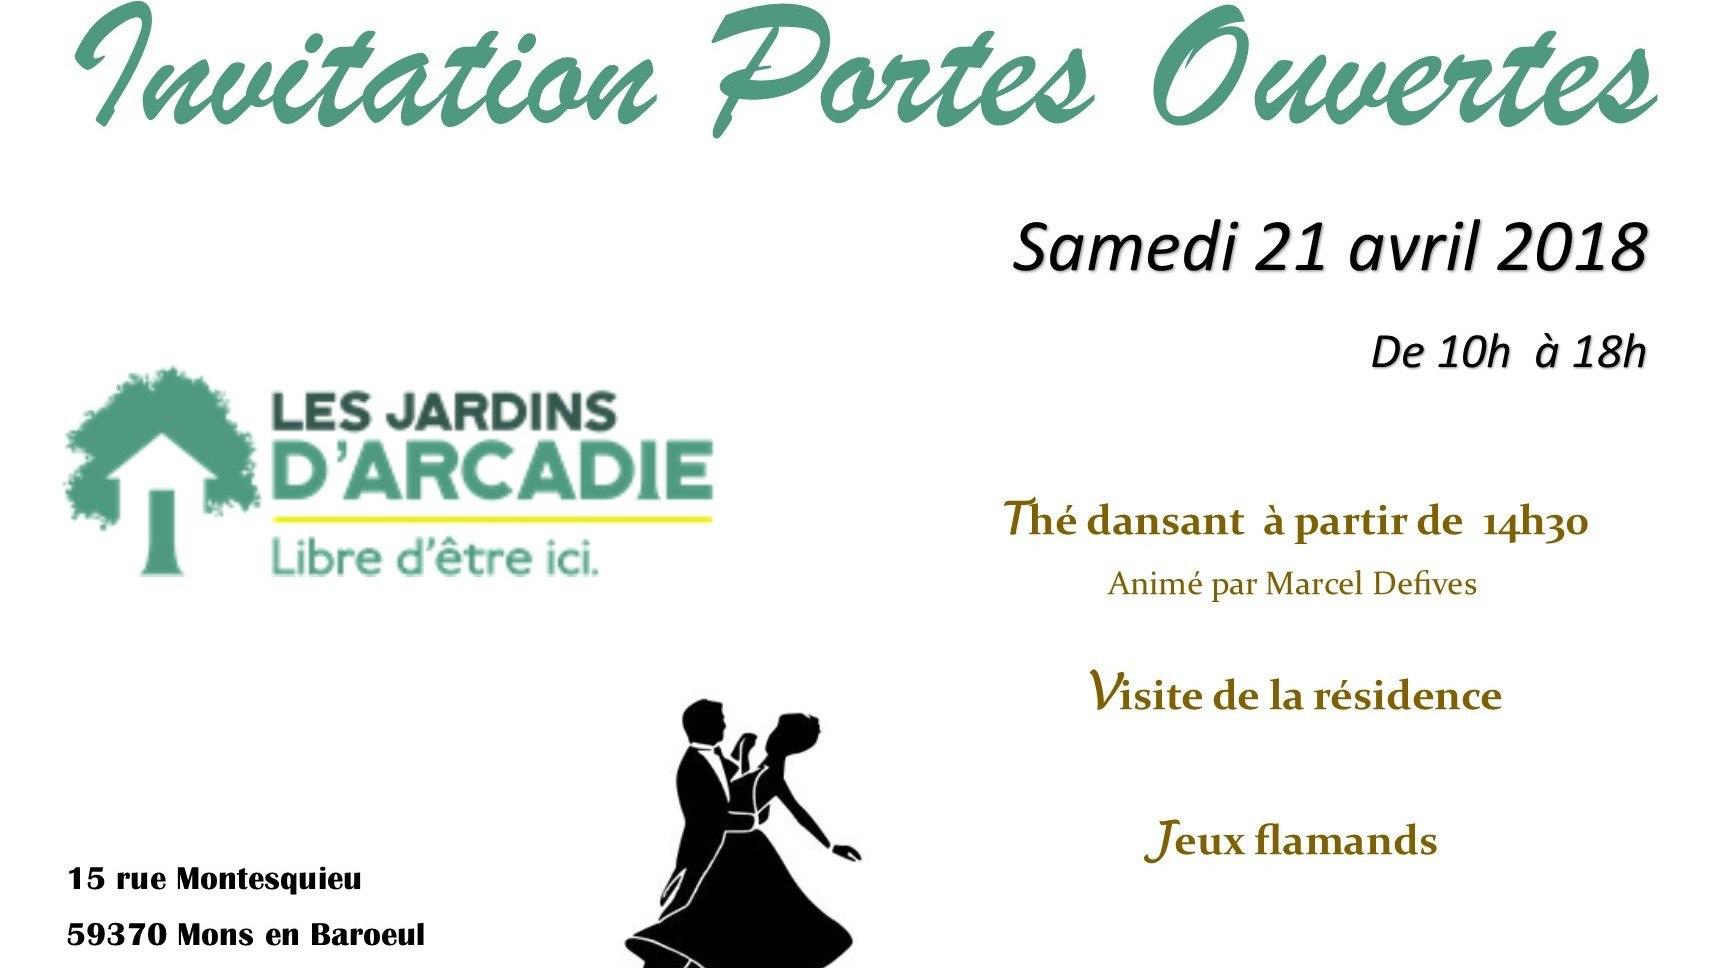 Les Jardins d'Arcadie Mons-en-Baroeul - Résidence Services Seniors